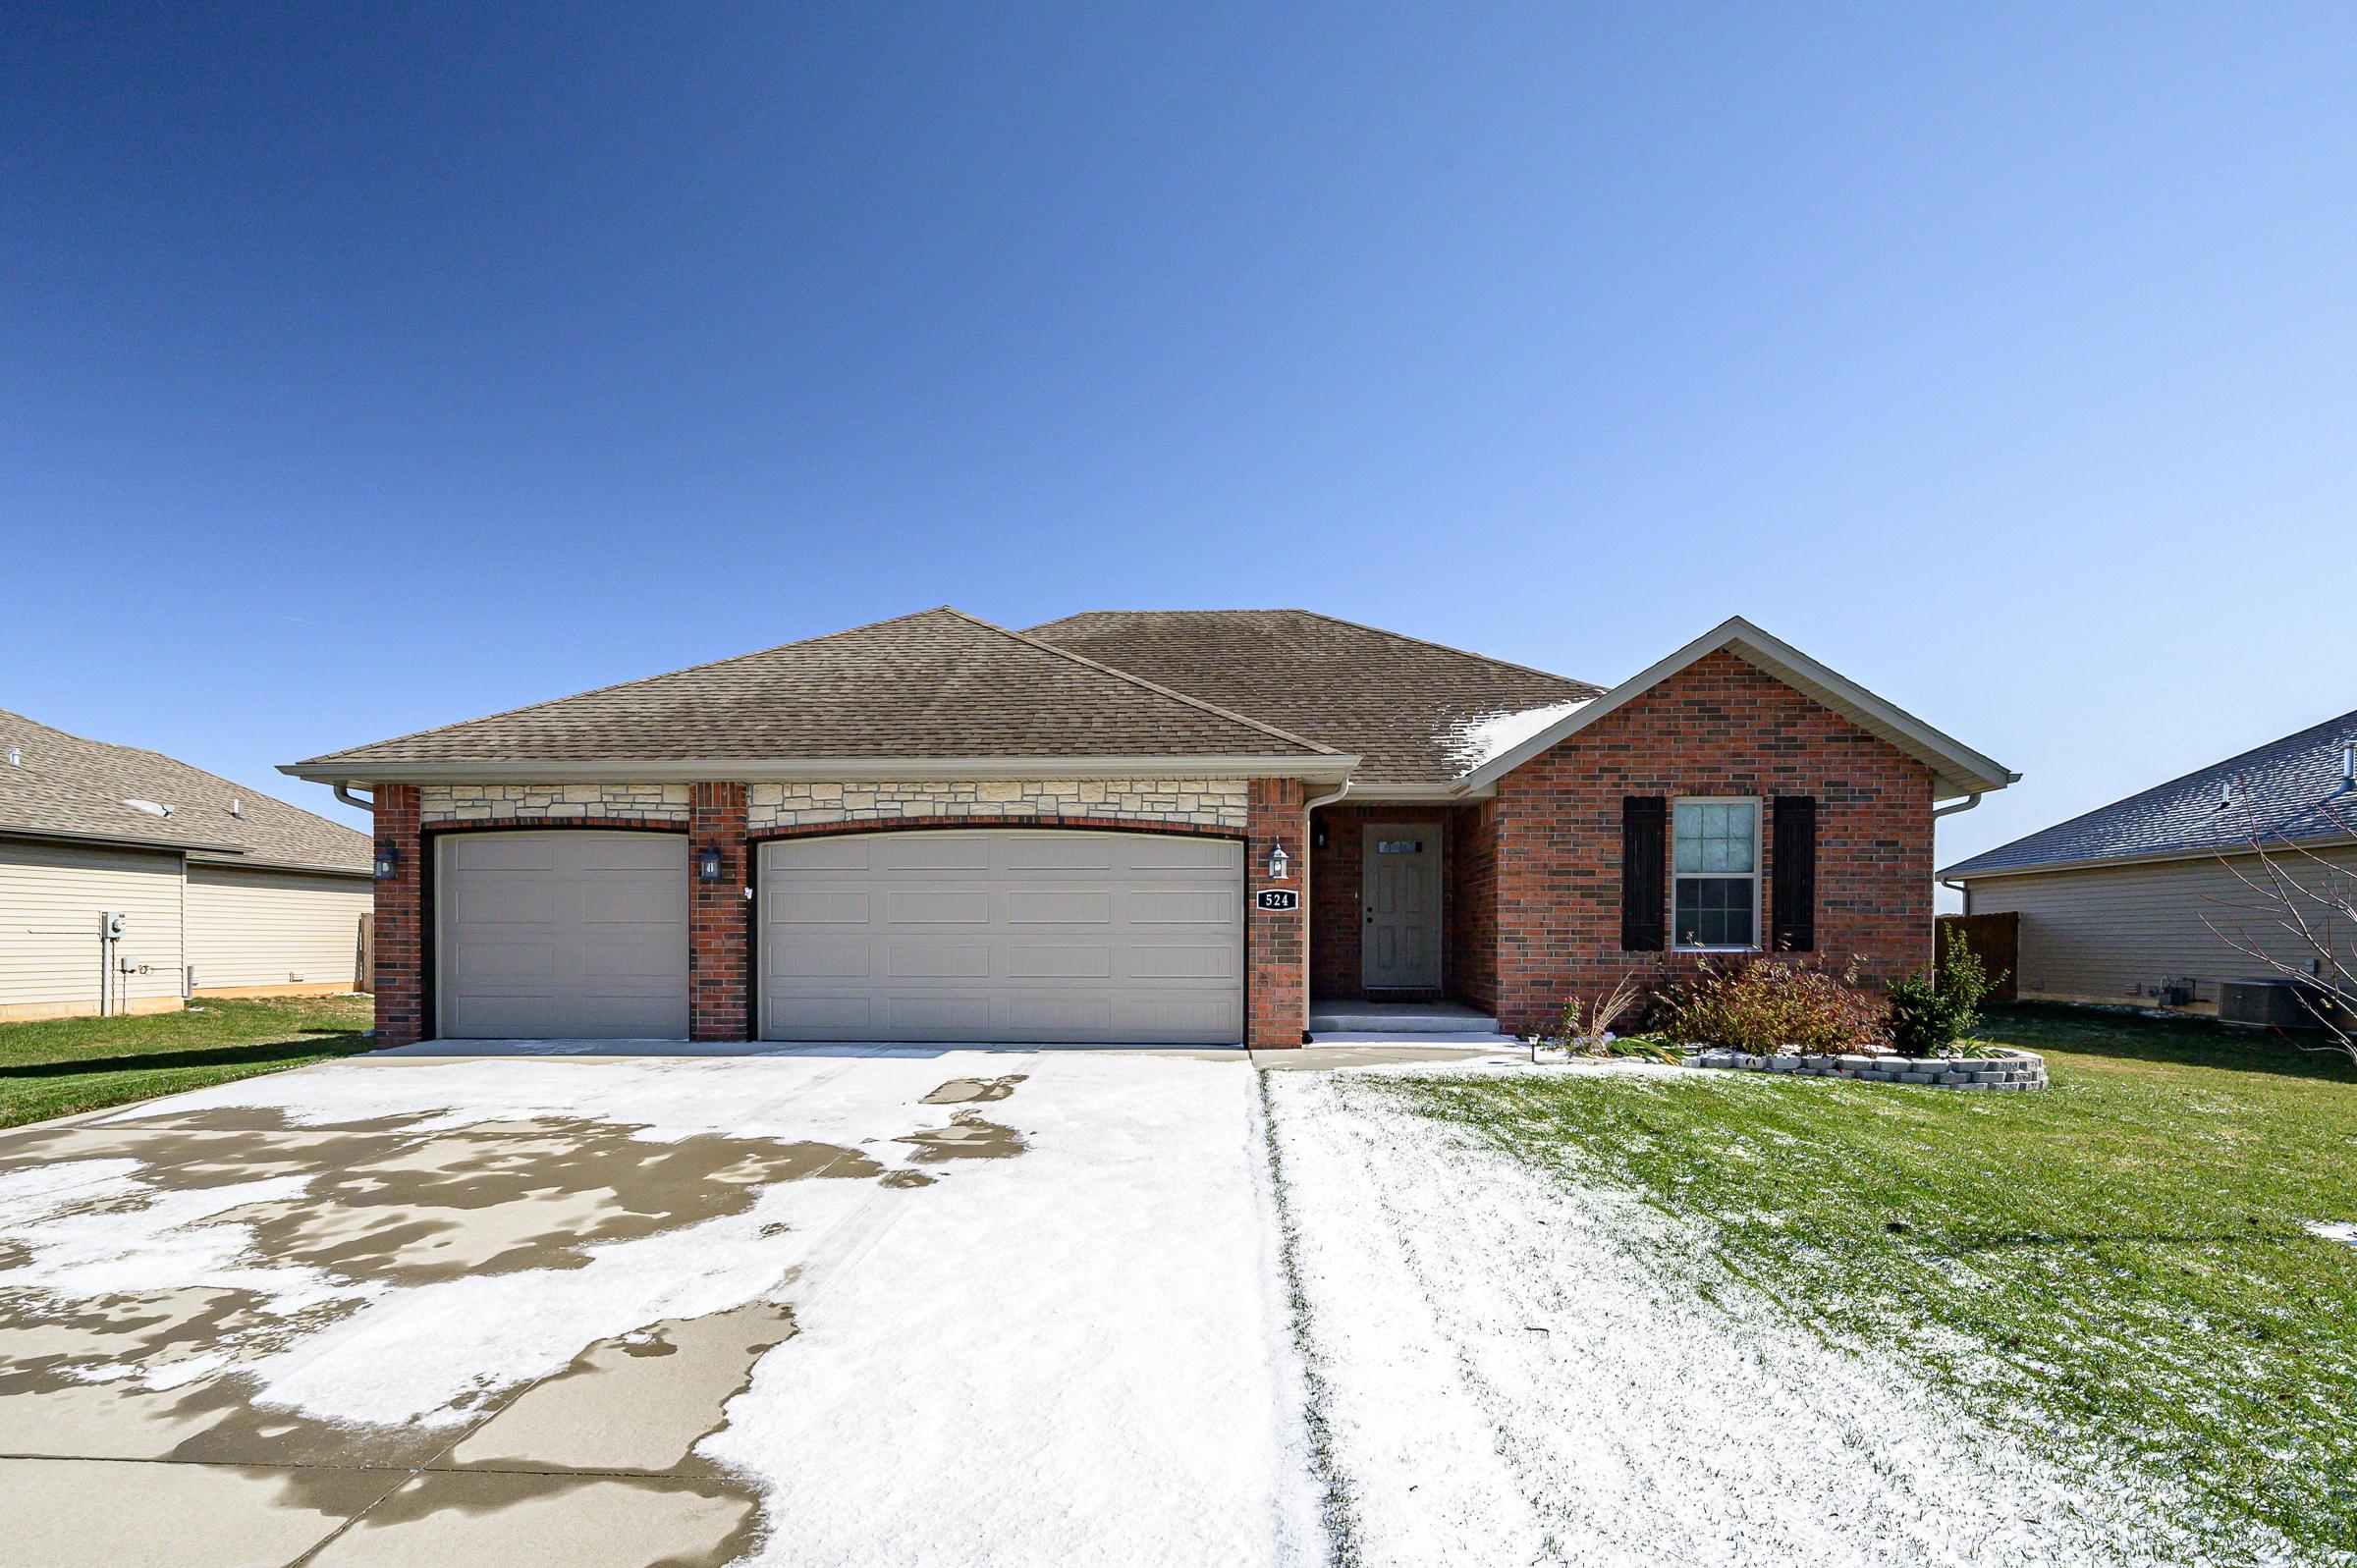 524 Patriot Place Drive Rogersville, MO 65742